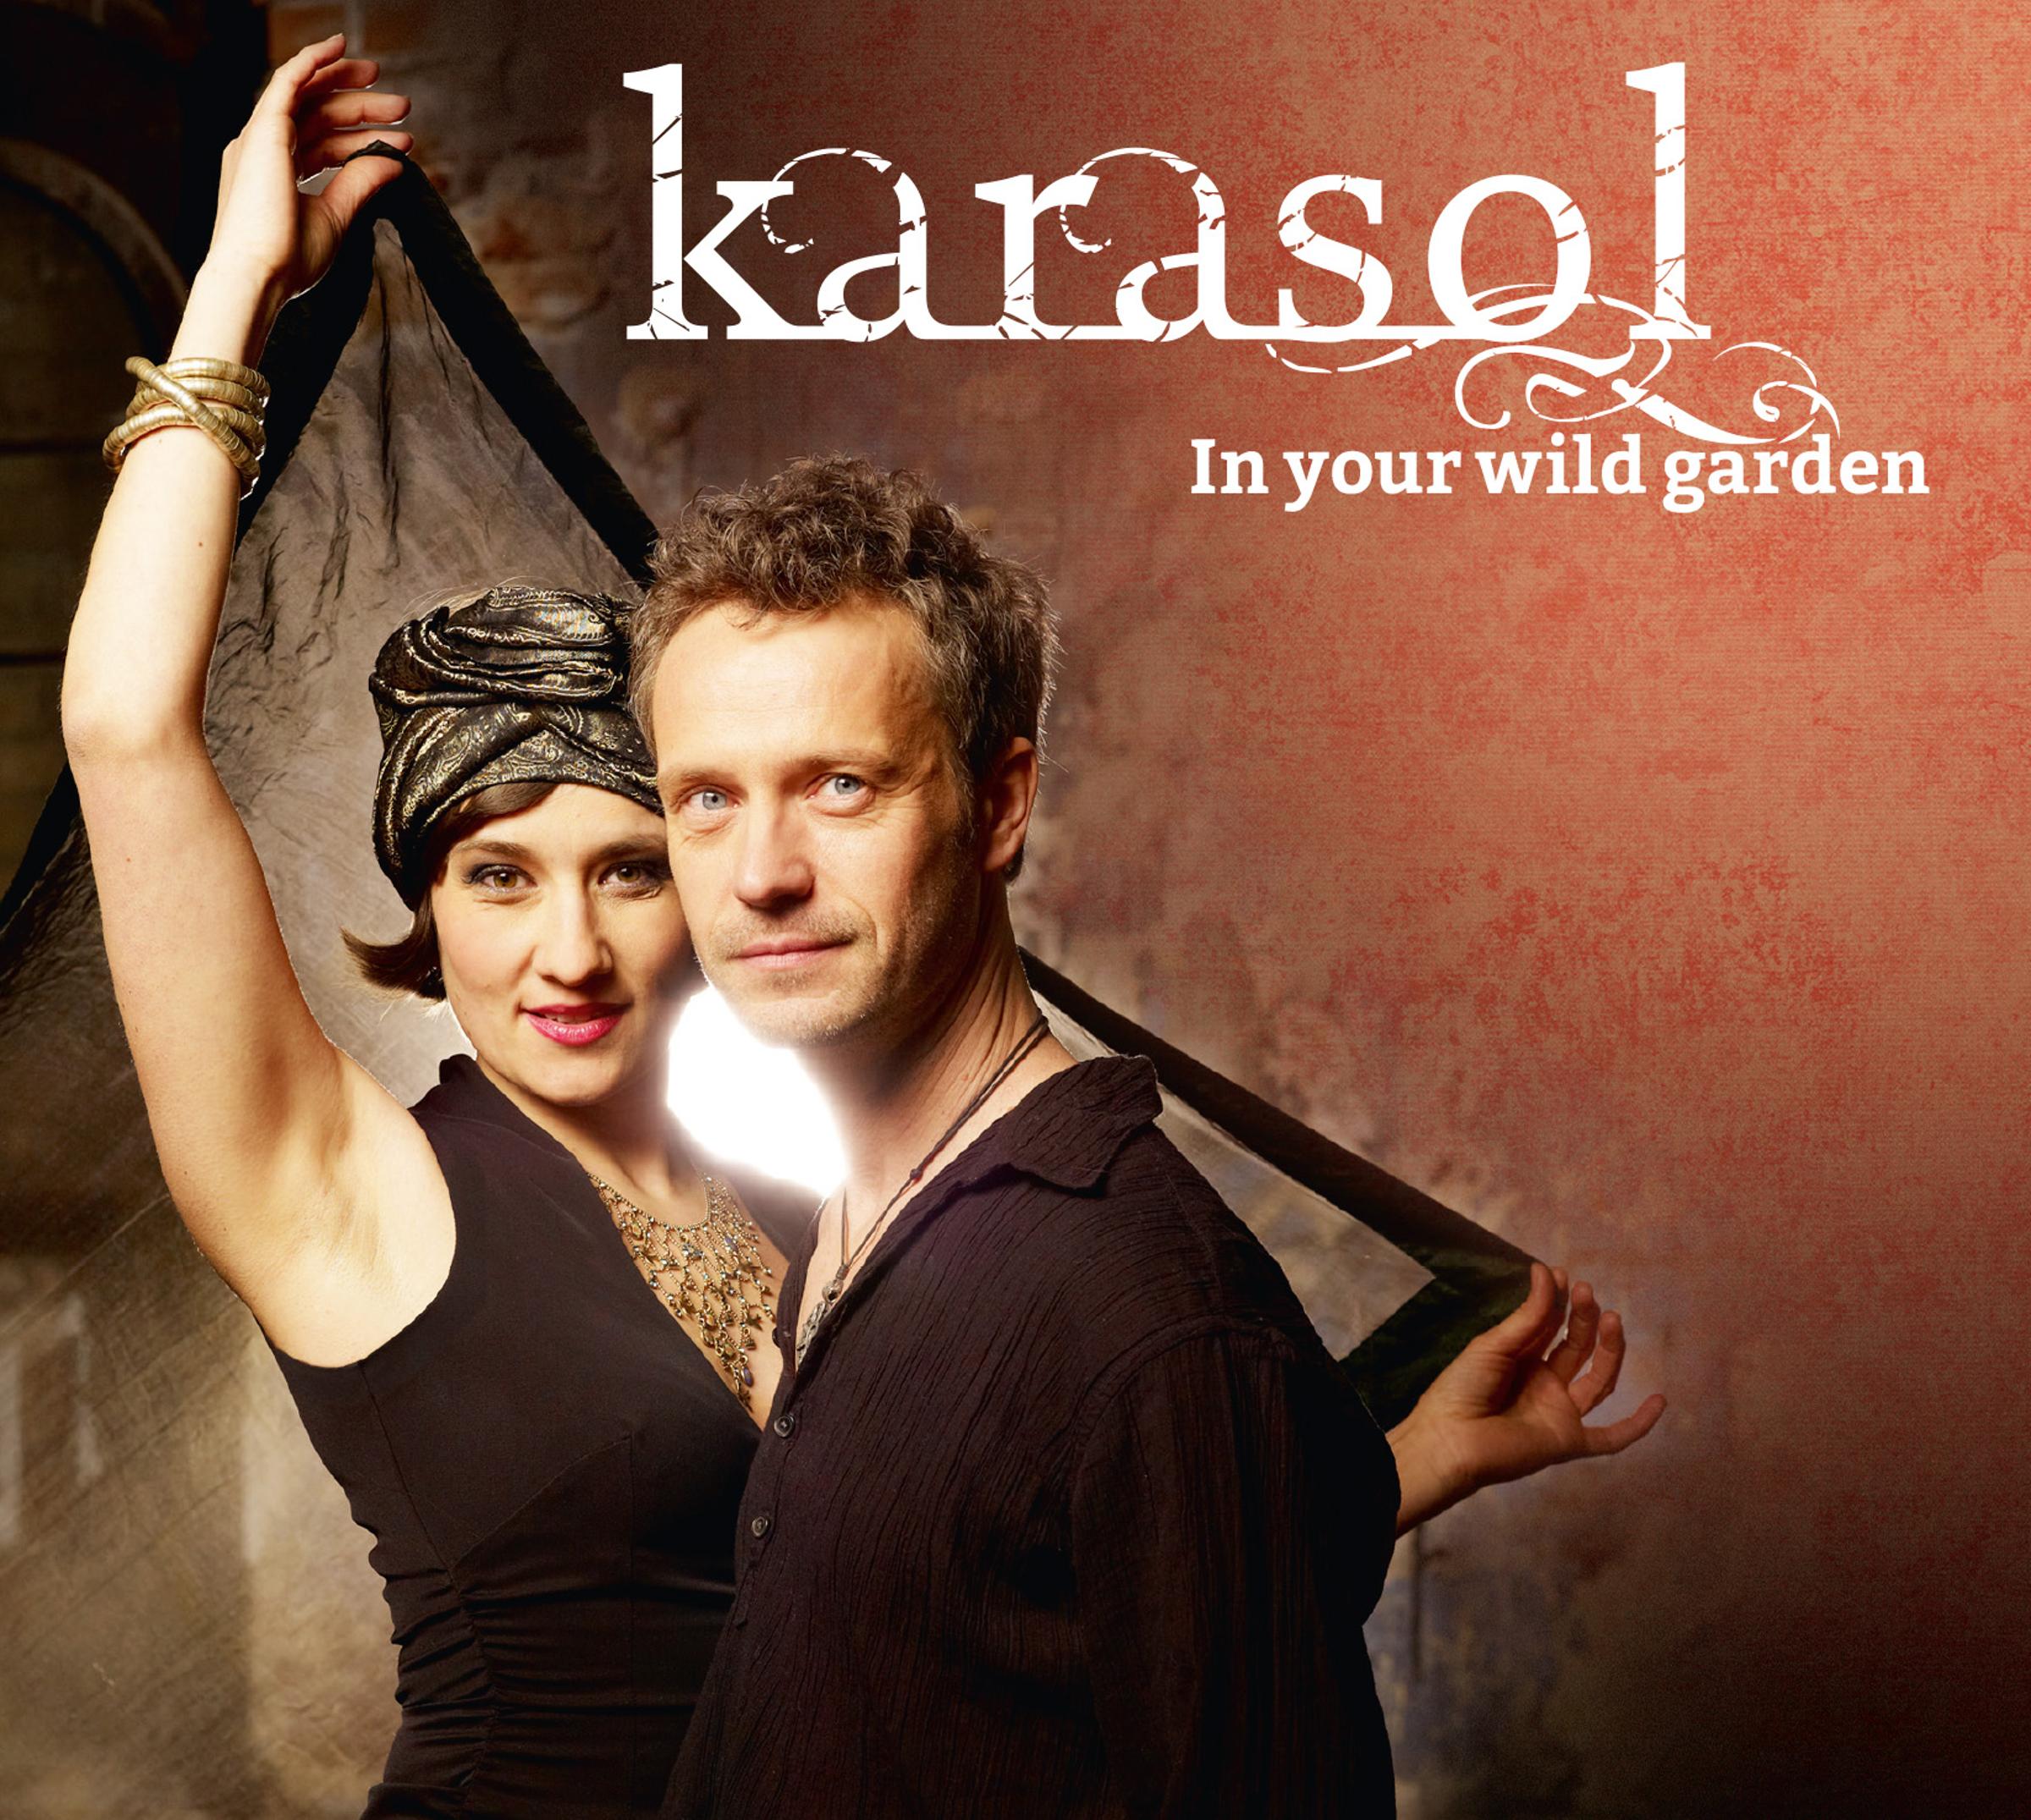 Cover_Karasol_2400x2400